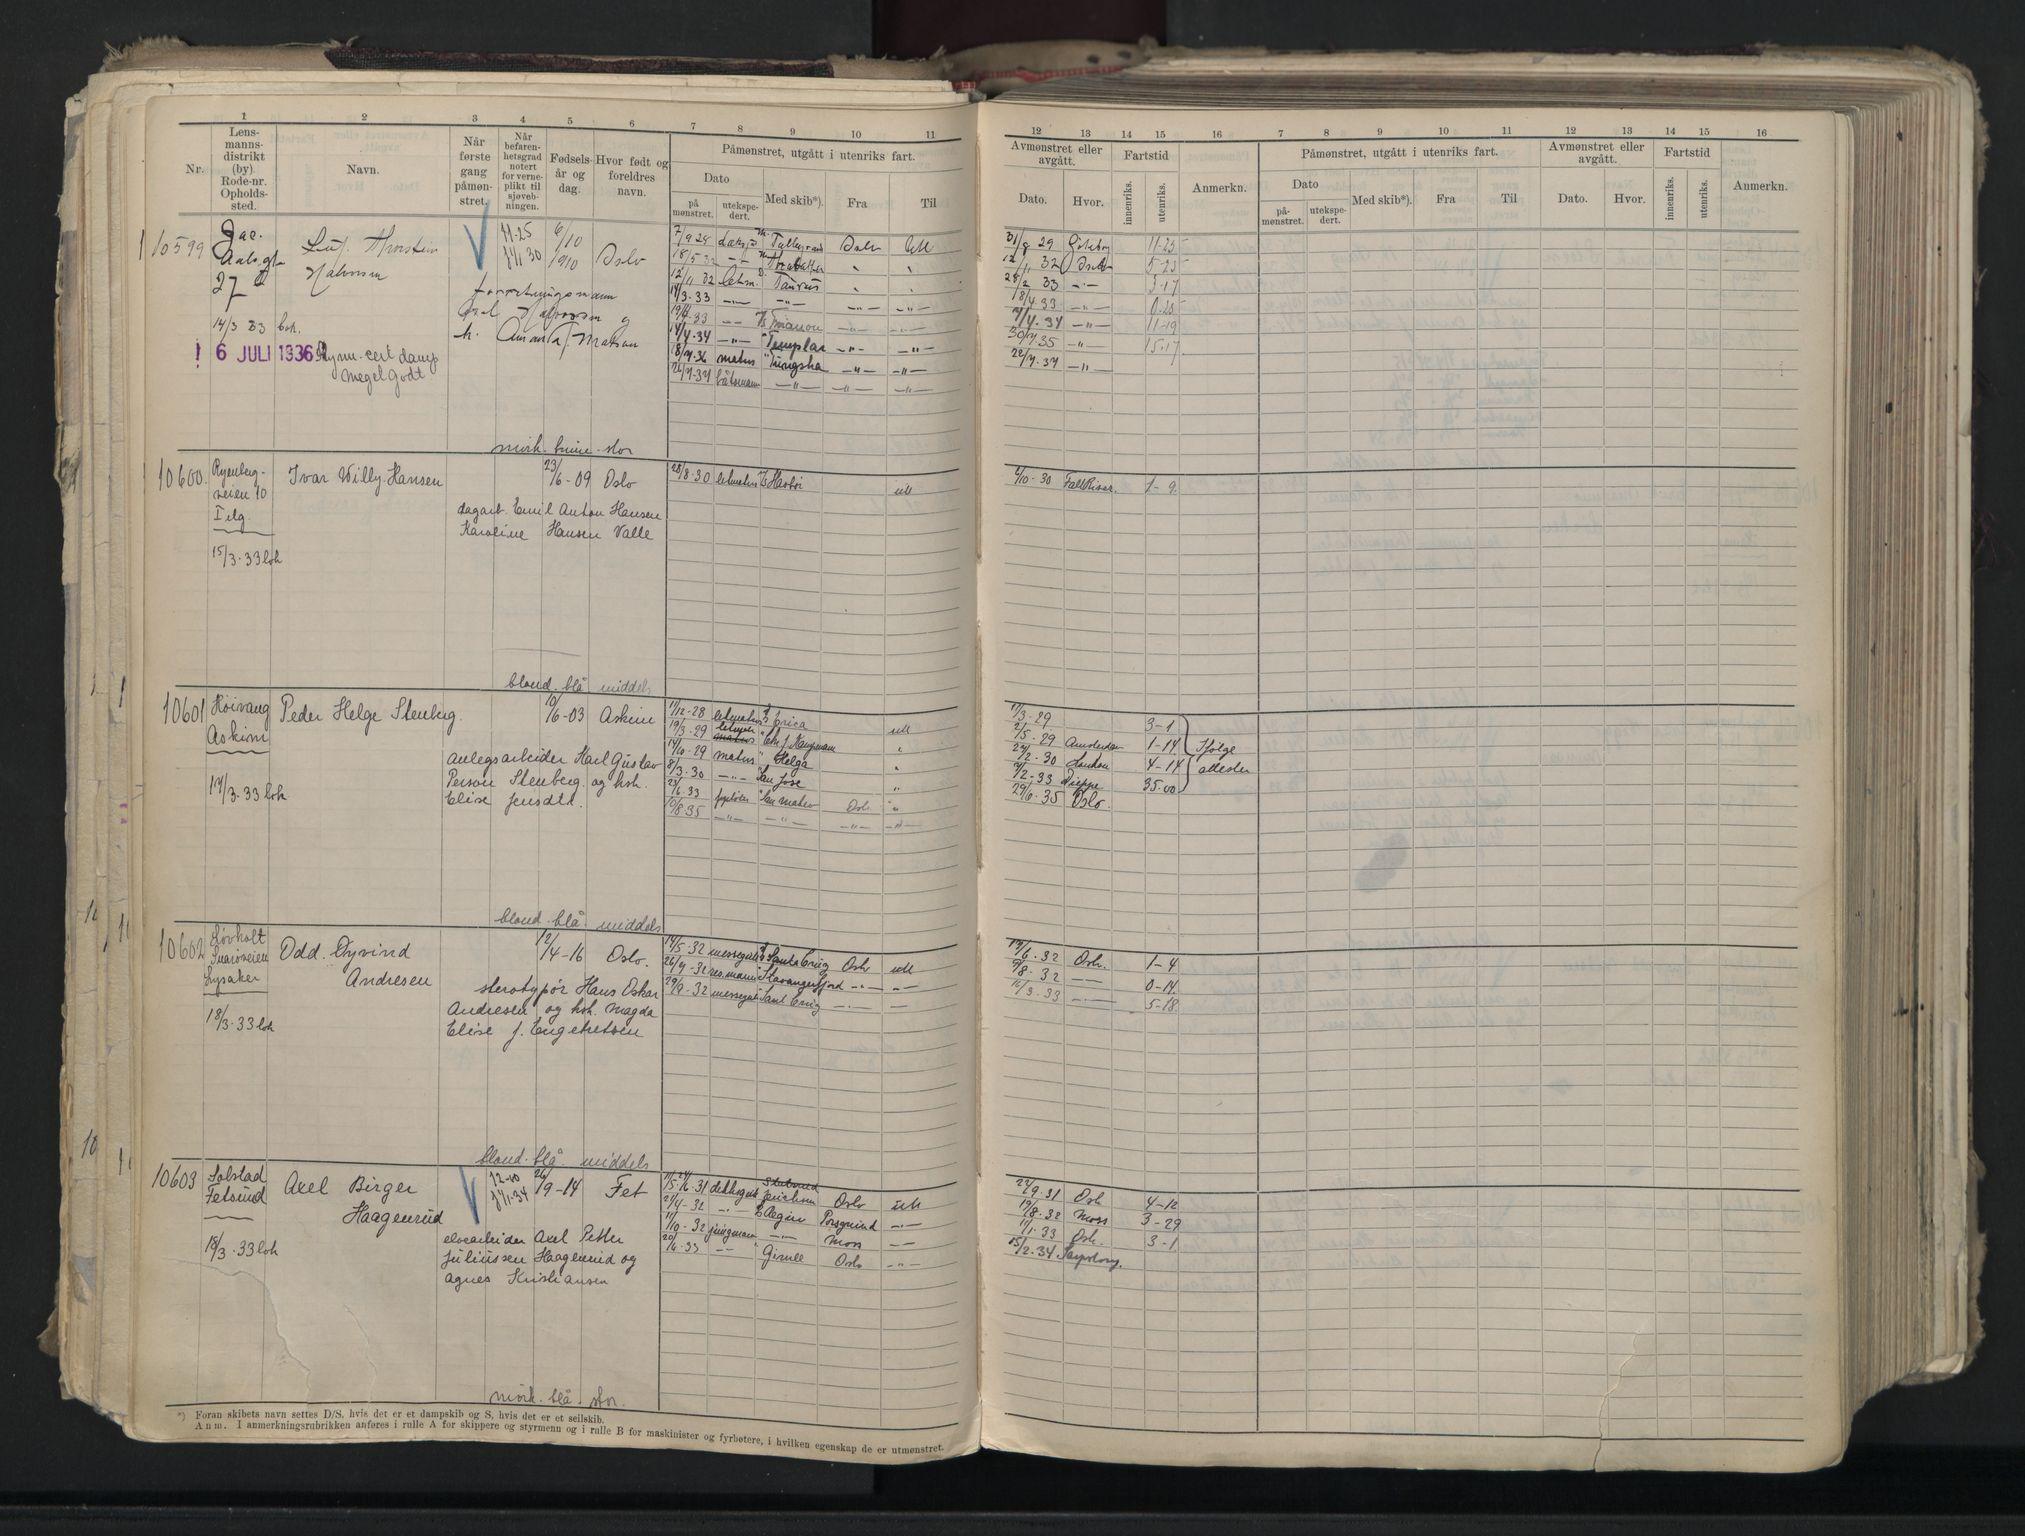 SAO, Oslo sjømannskontor, F/Fc/L0007: Hovedrulle, 1930-1948, s. 117